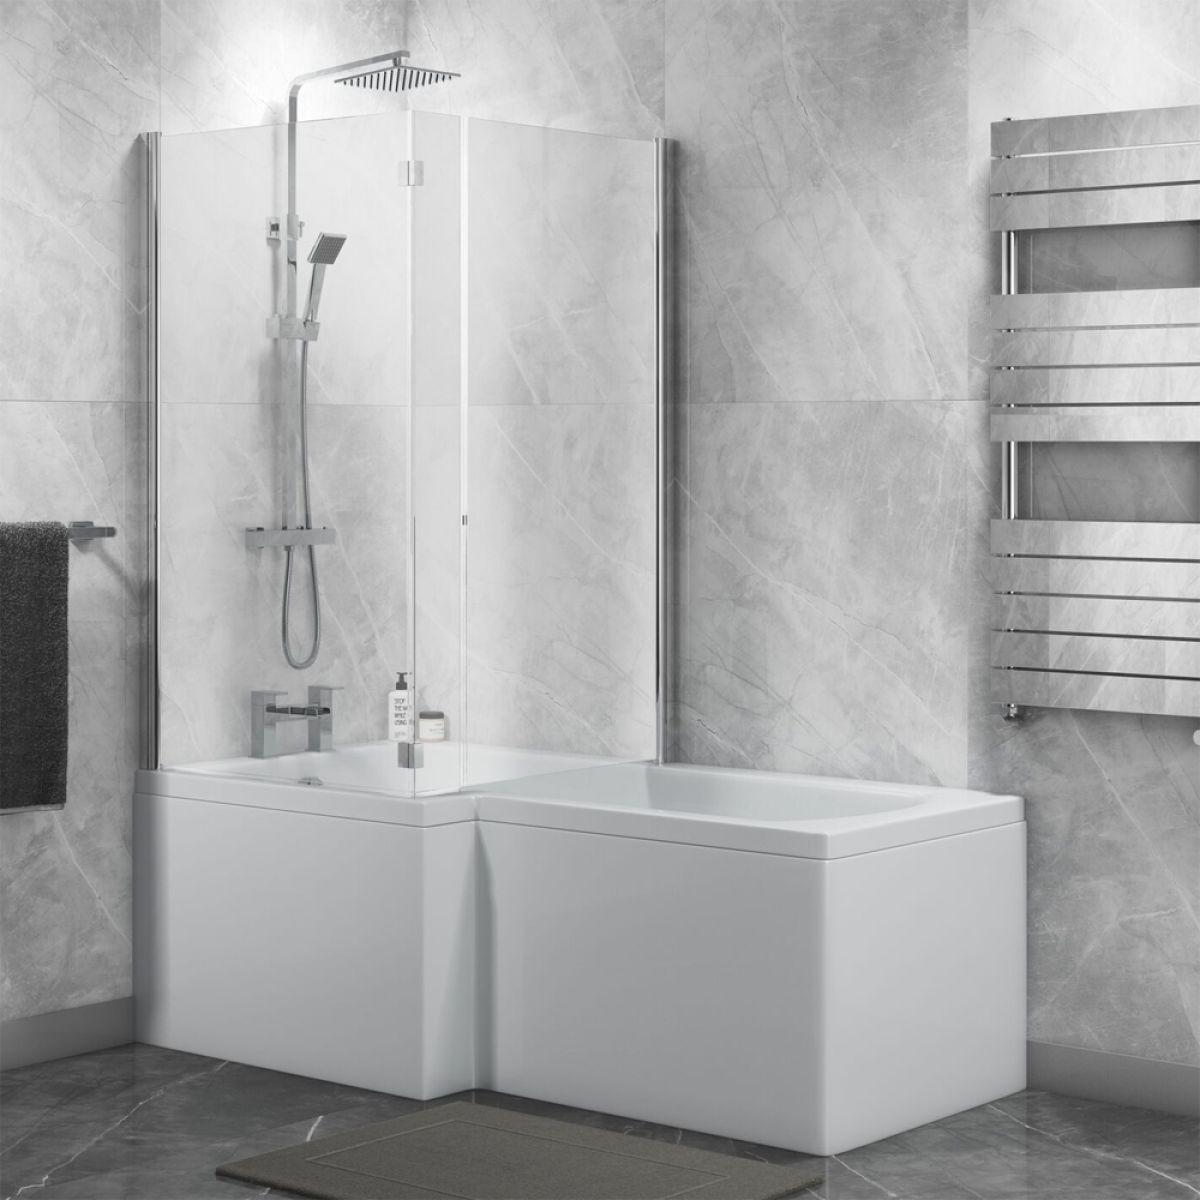 Showerbath End Panel Bath Panel For P /& L Shaped Showerbaths Cavalier Only